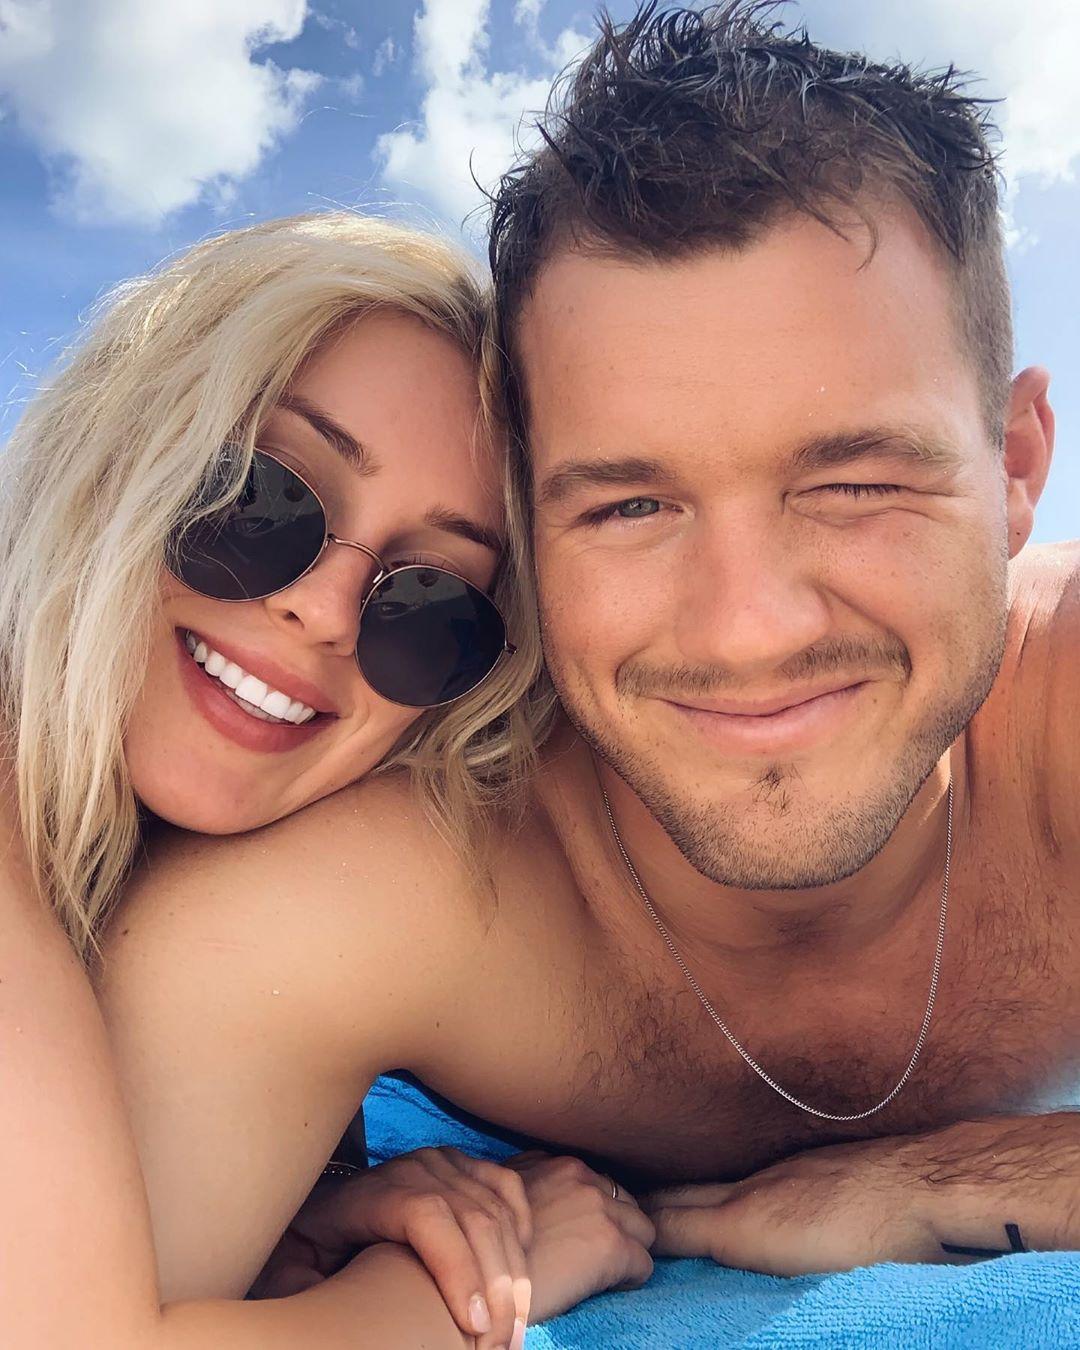 Bachelor's Colton Underwood, Cassie Randolph on Bermuda Vacation